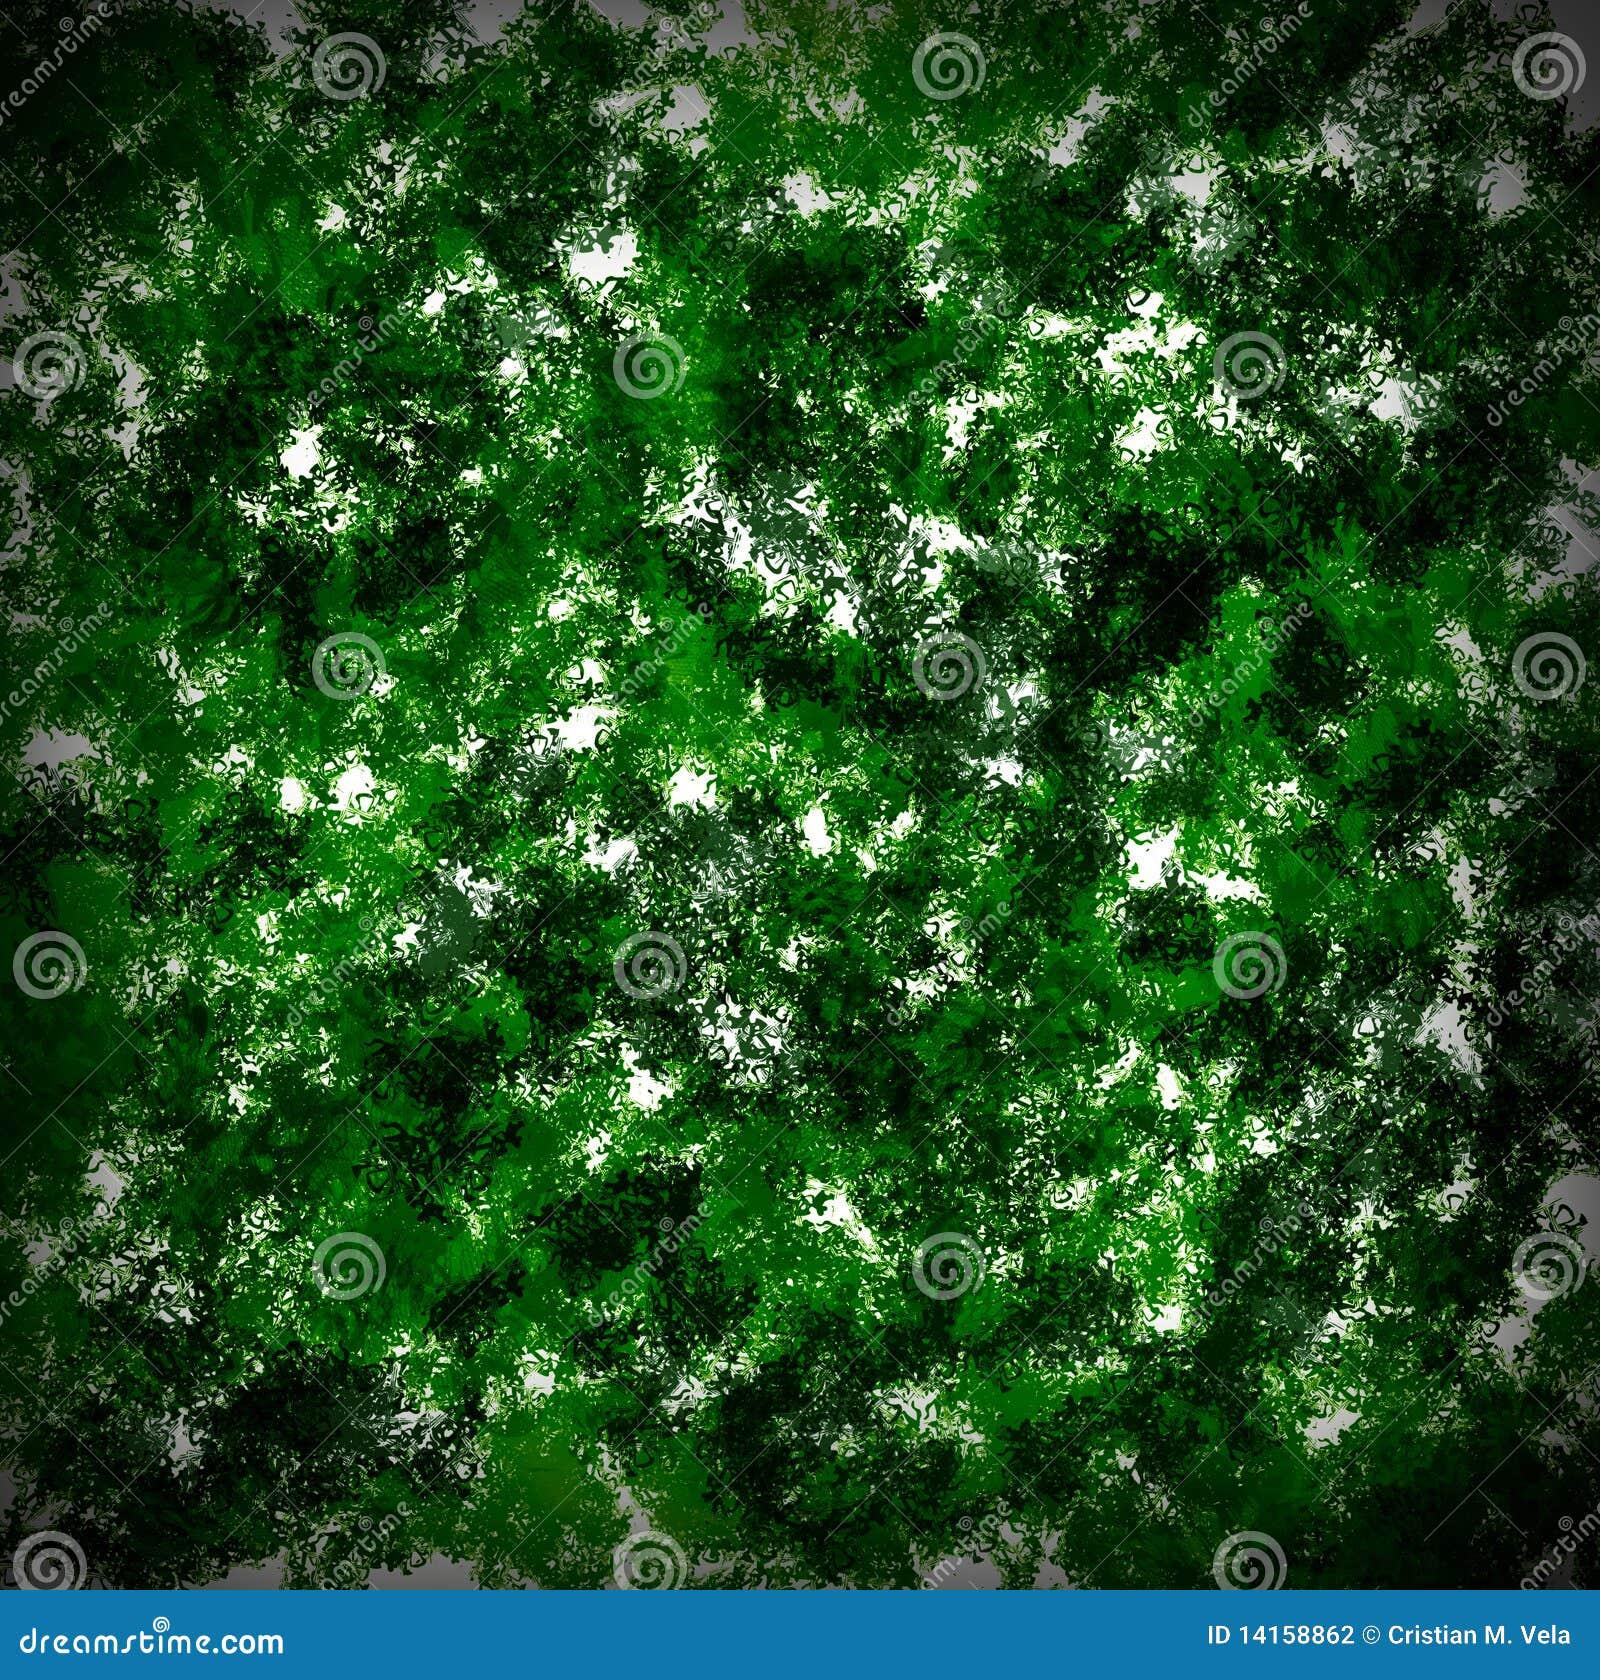 green grunge texture thumb - photo #36